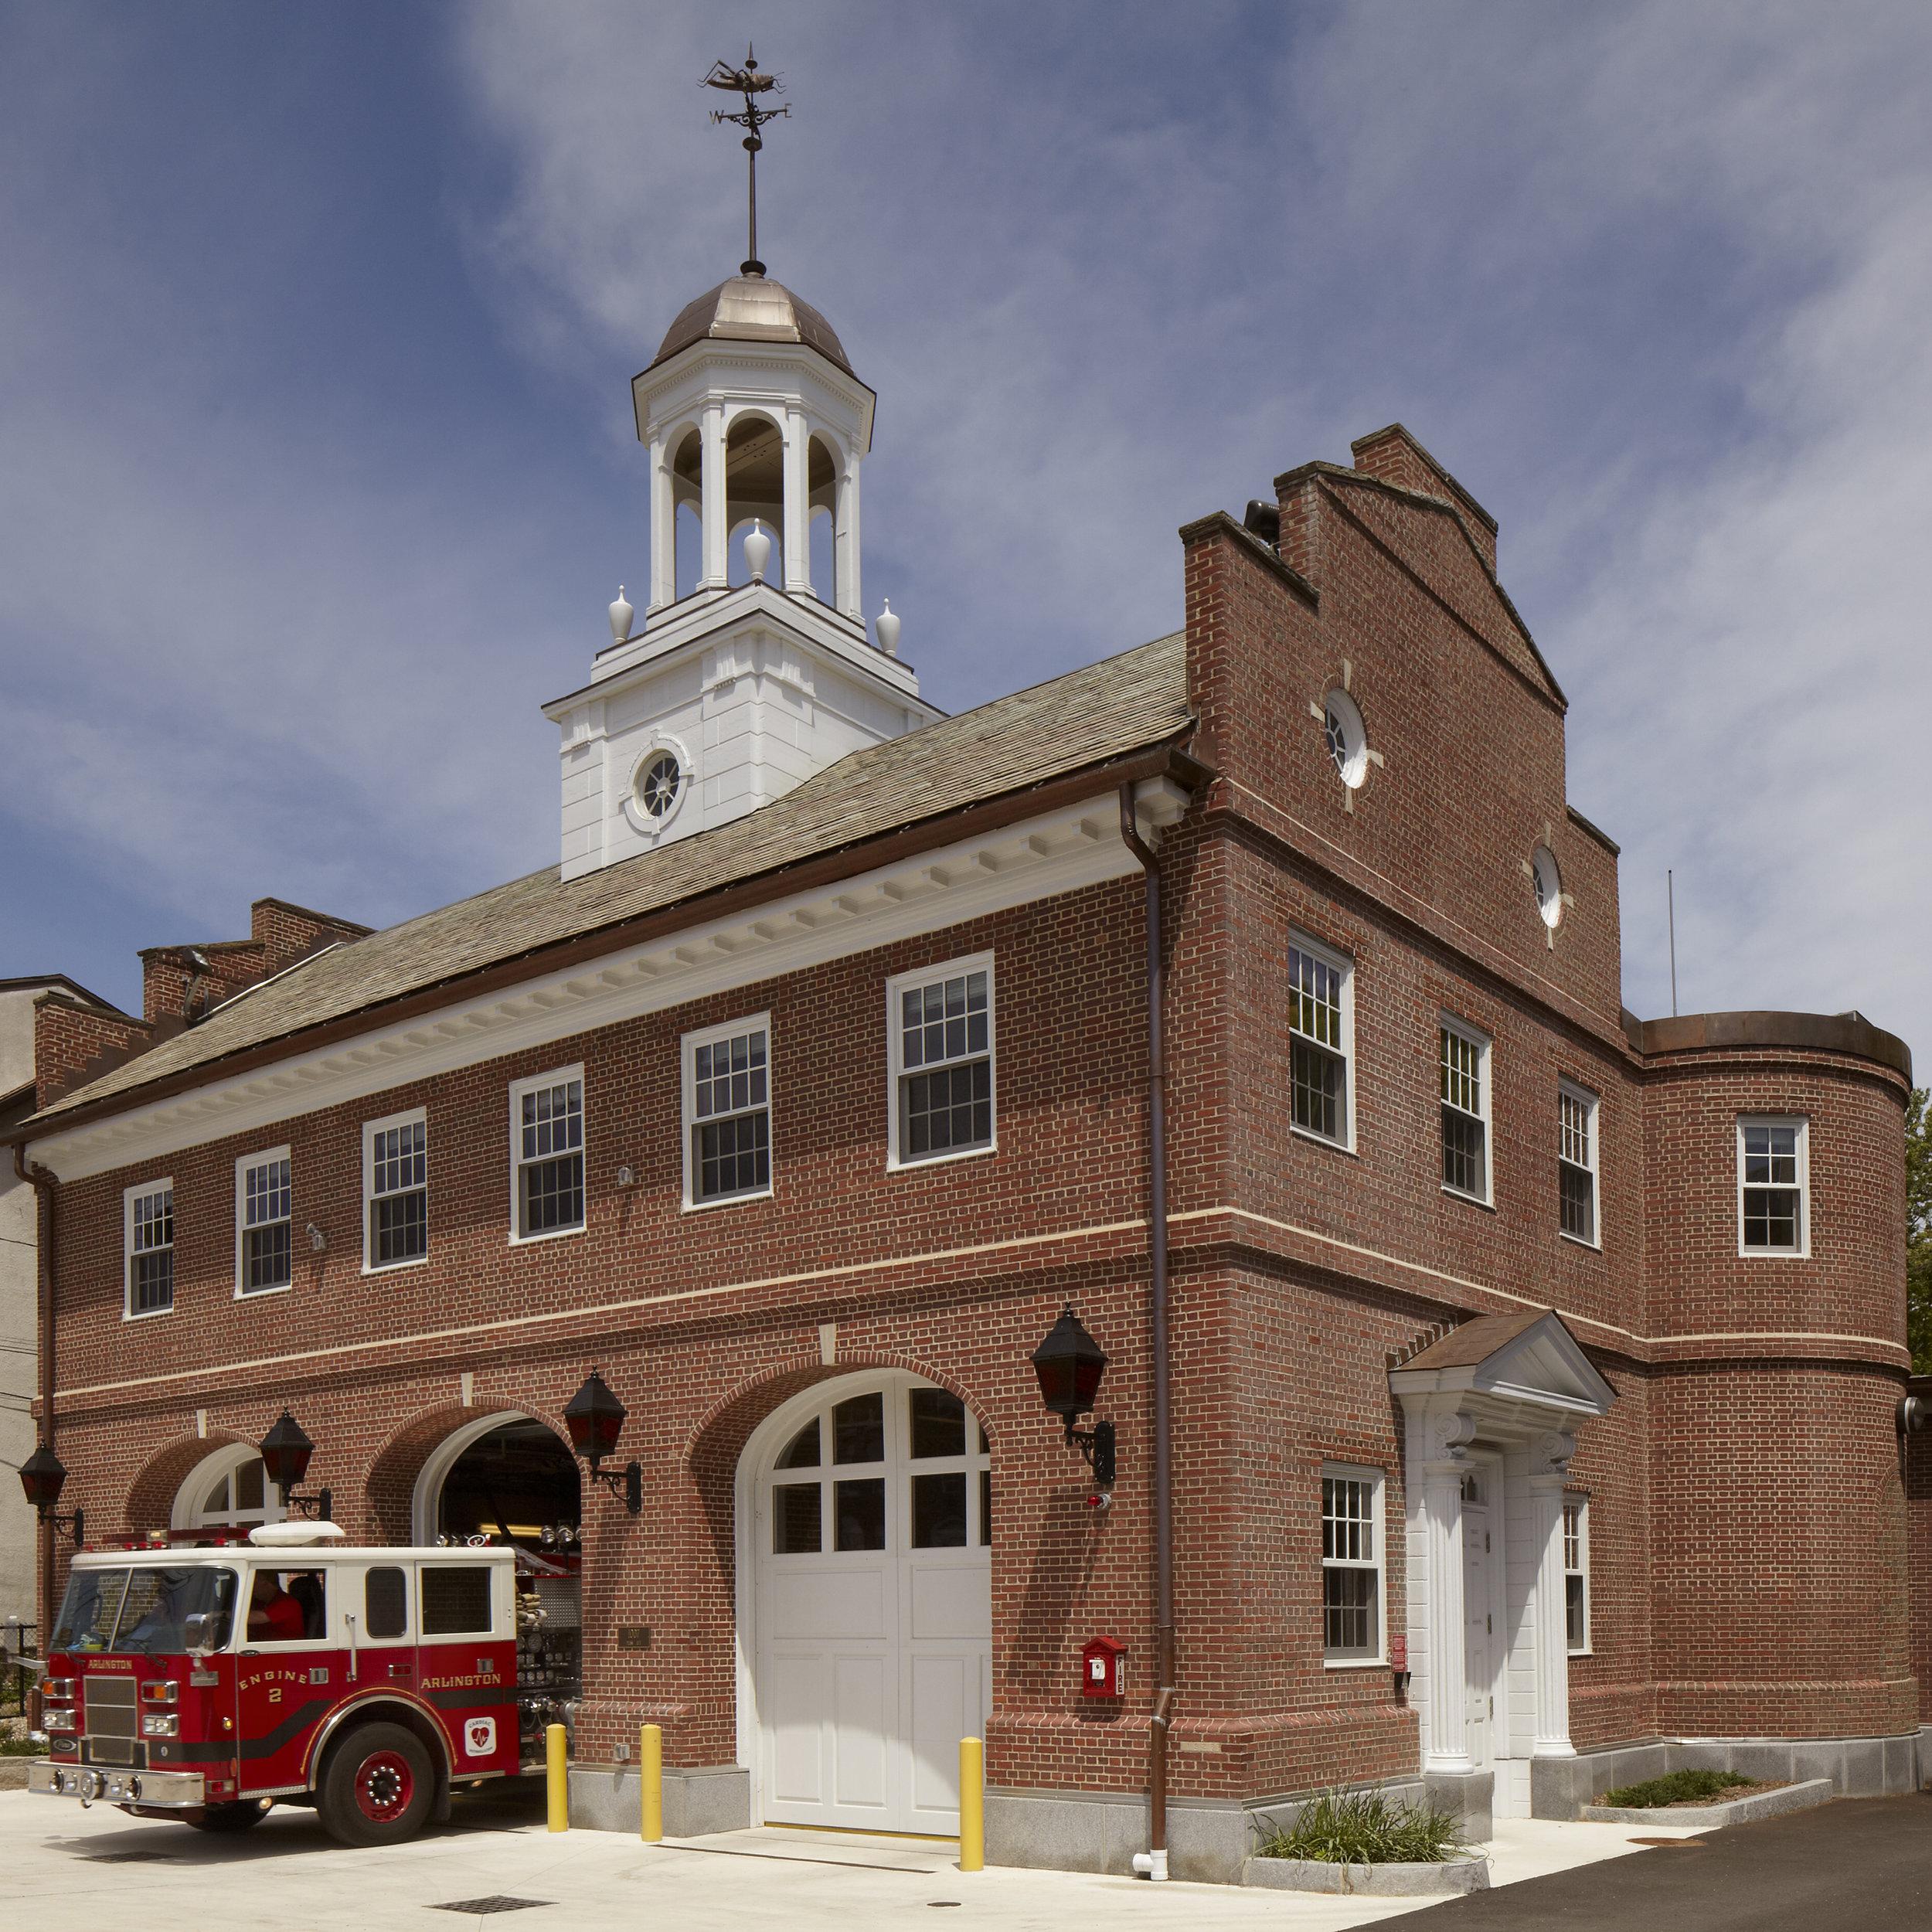 Arlington Highland Fire Station -